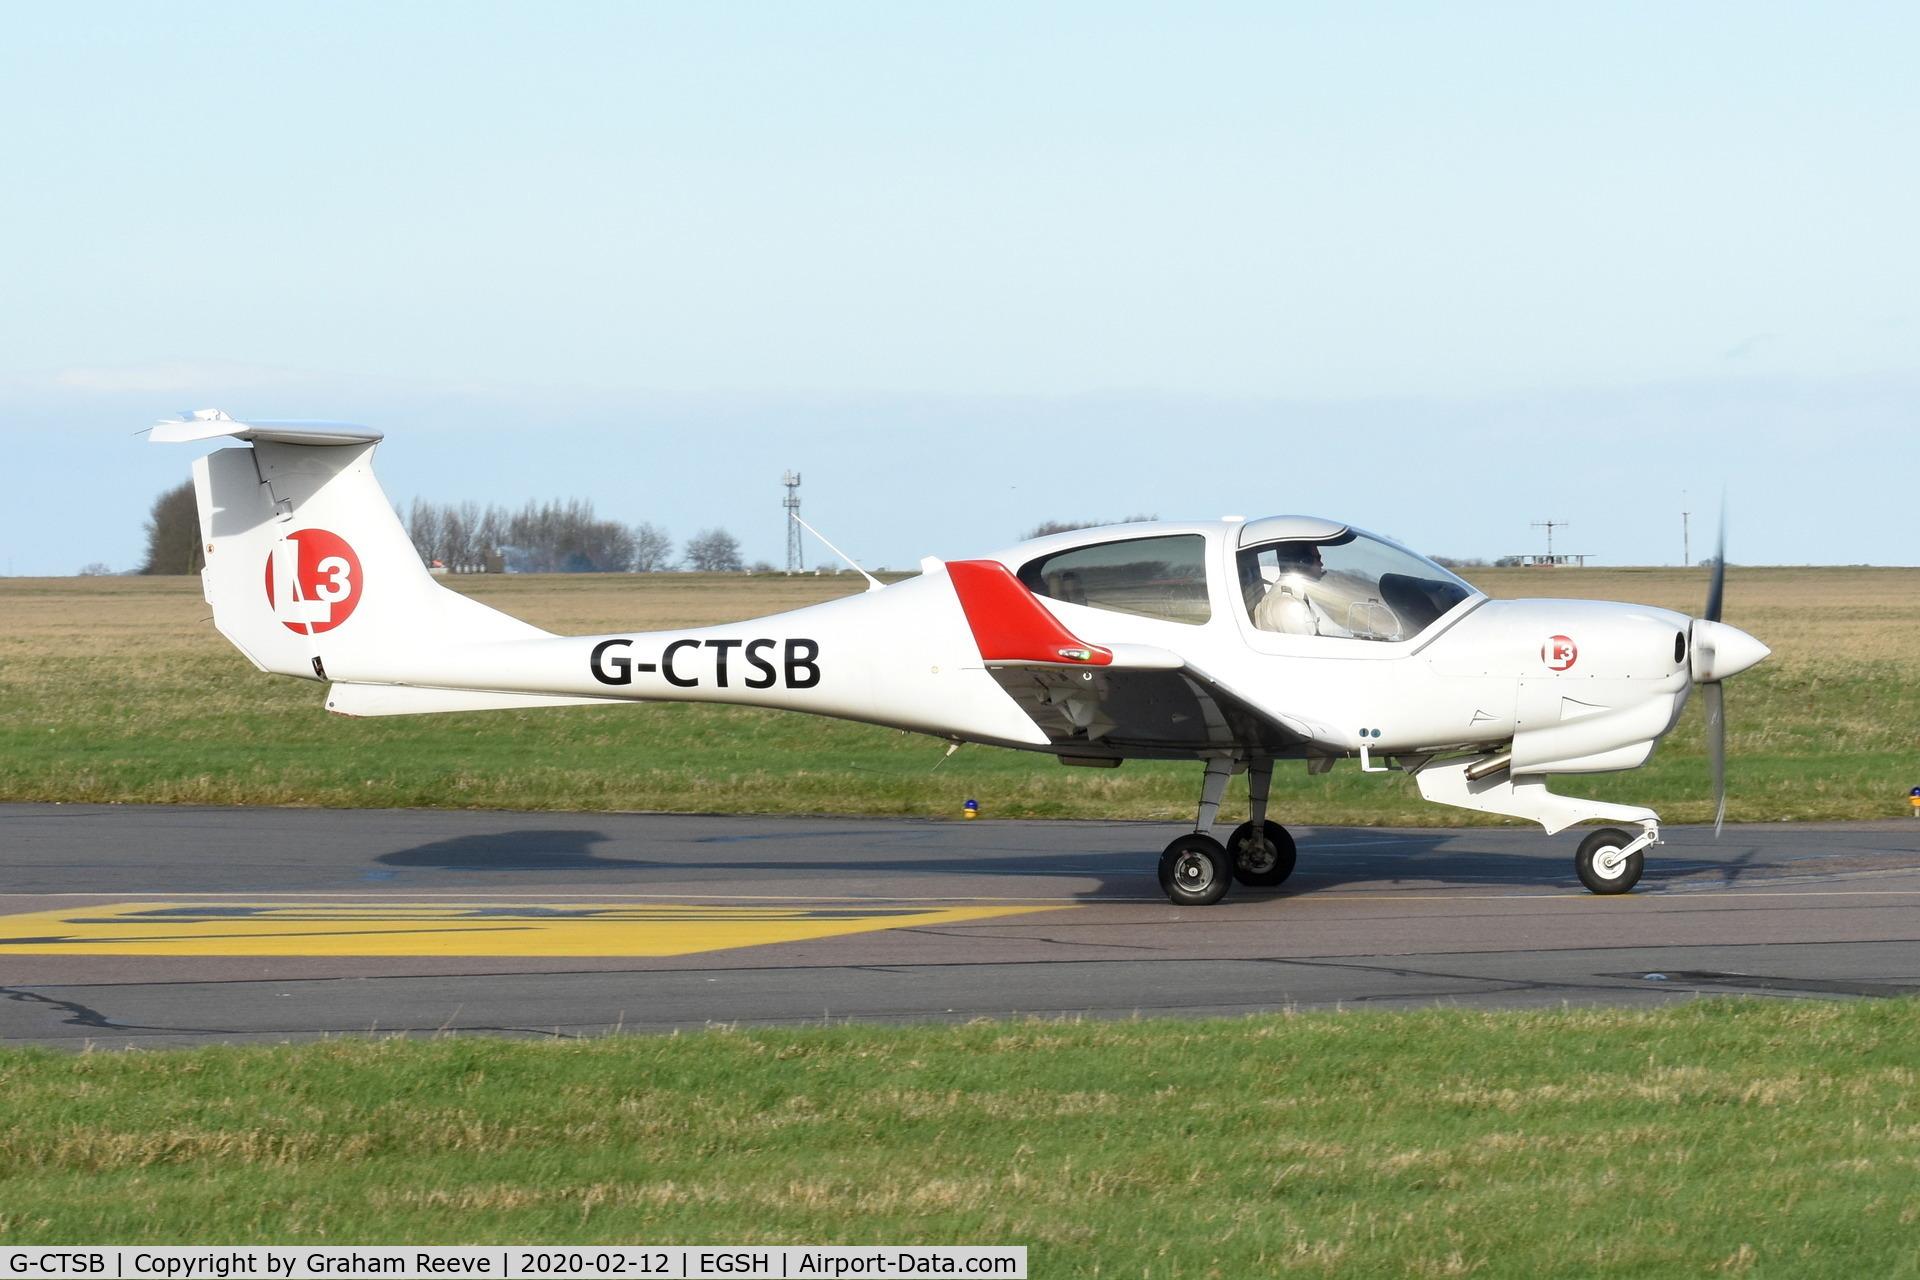 G-CTSB, 2015 Diamond DA-40NG Diamond Star C/N 40.N283, Departing from Norwich.